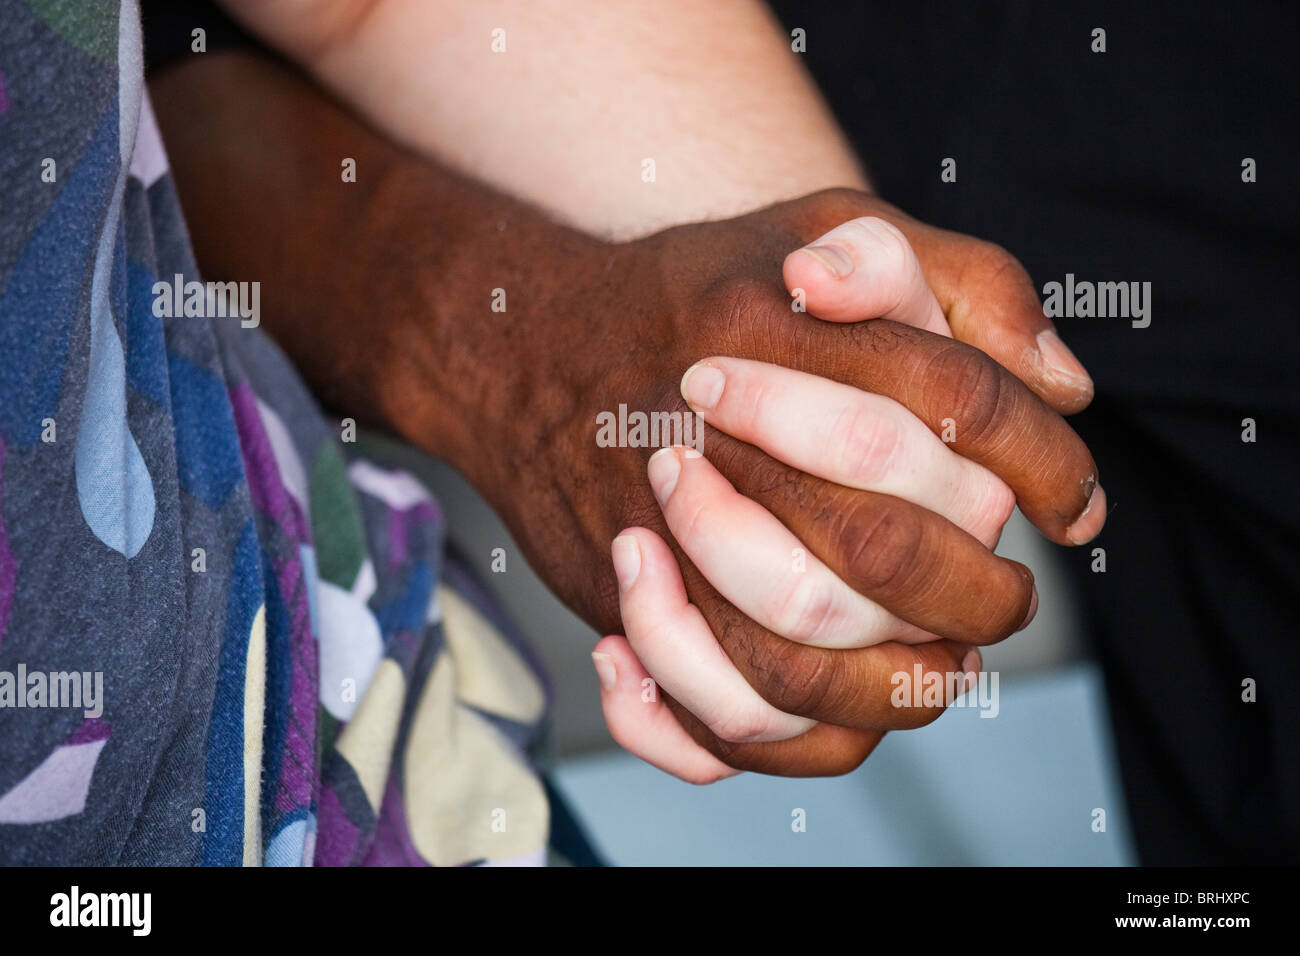 Interracial dating seattle washington